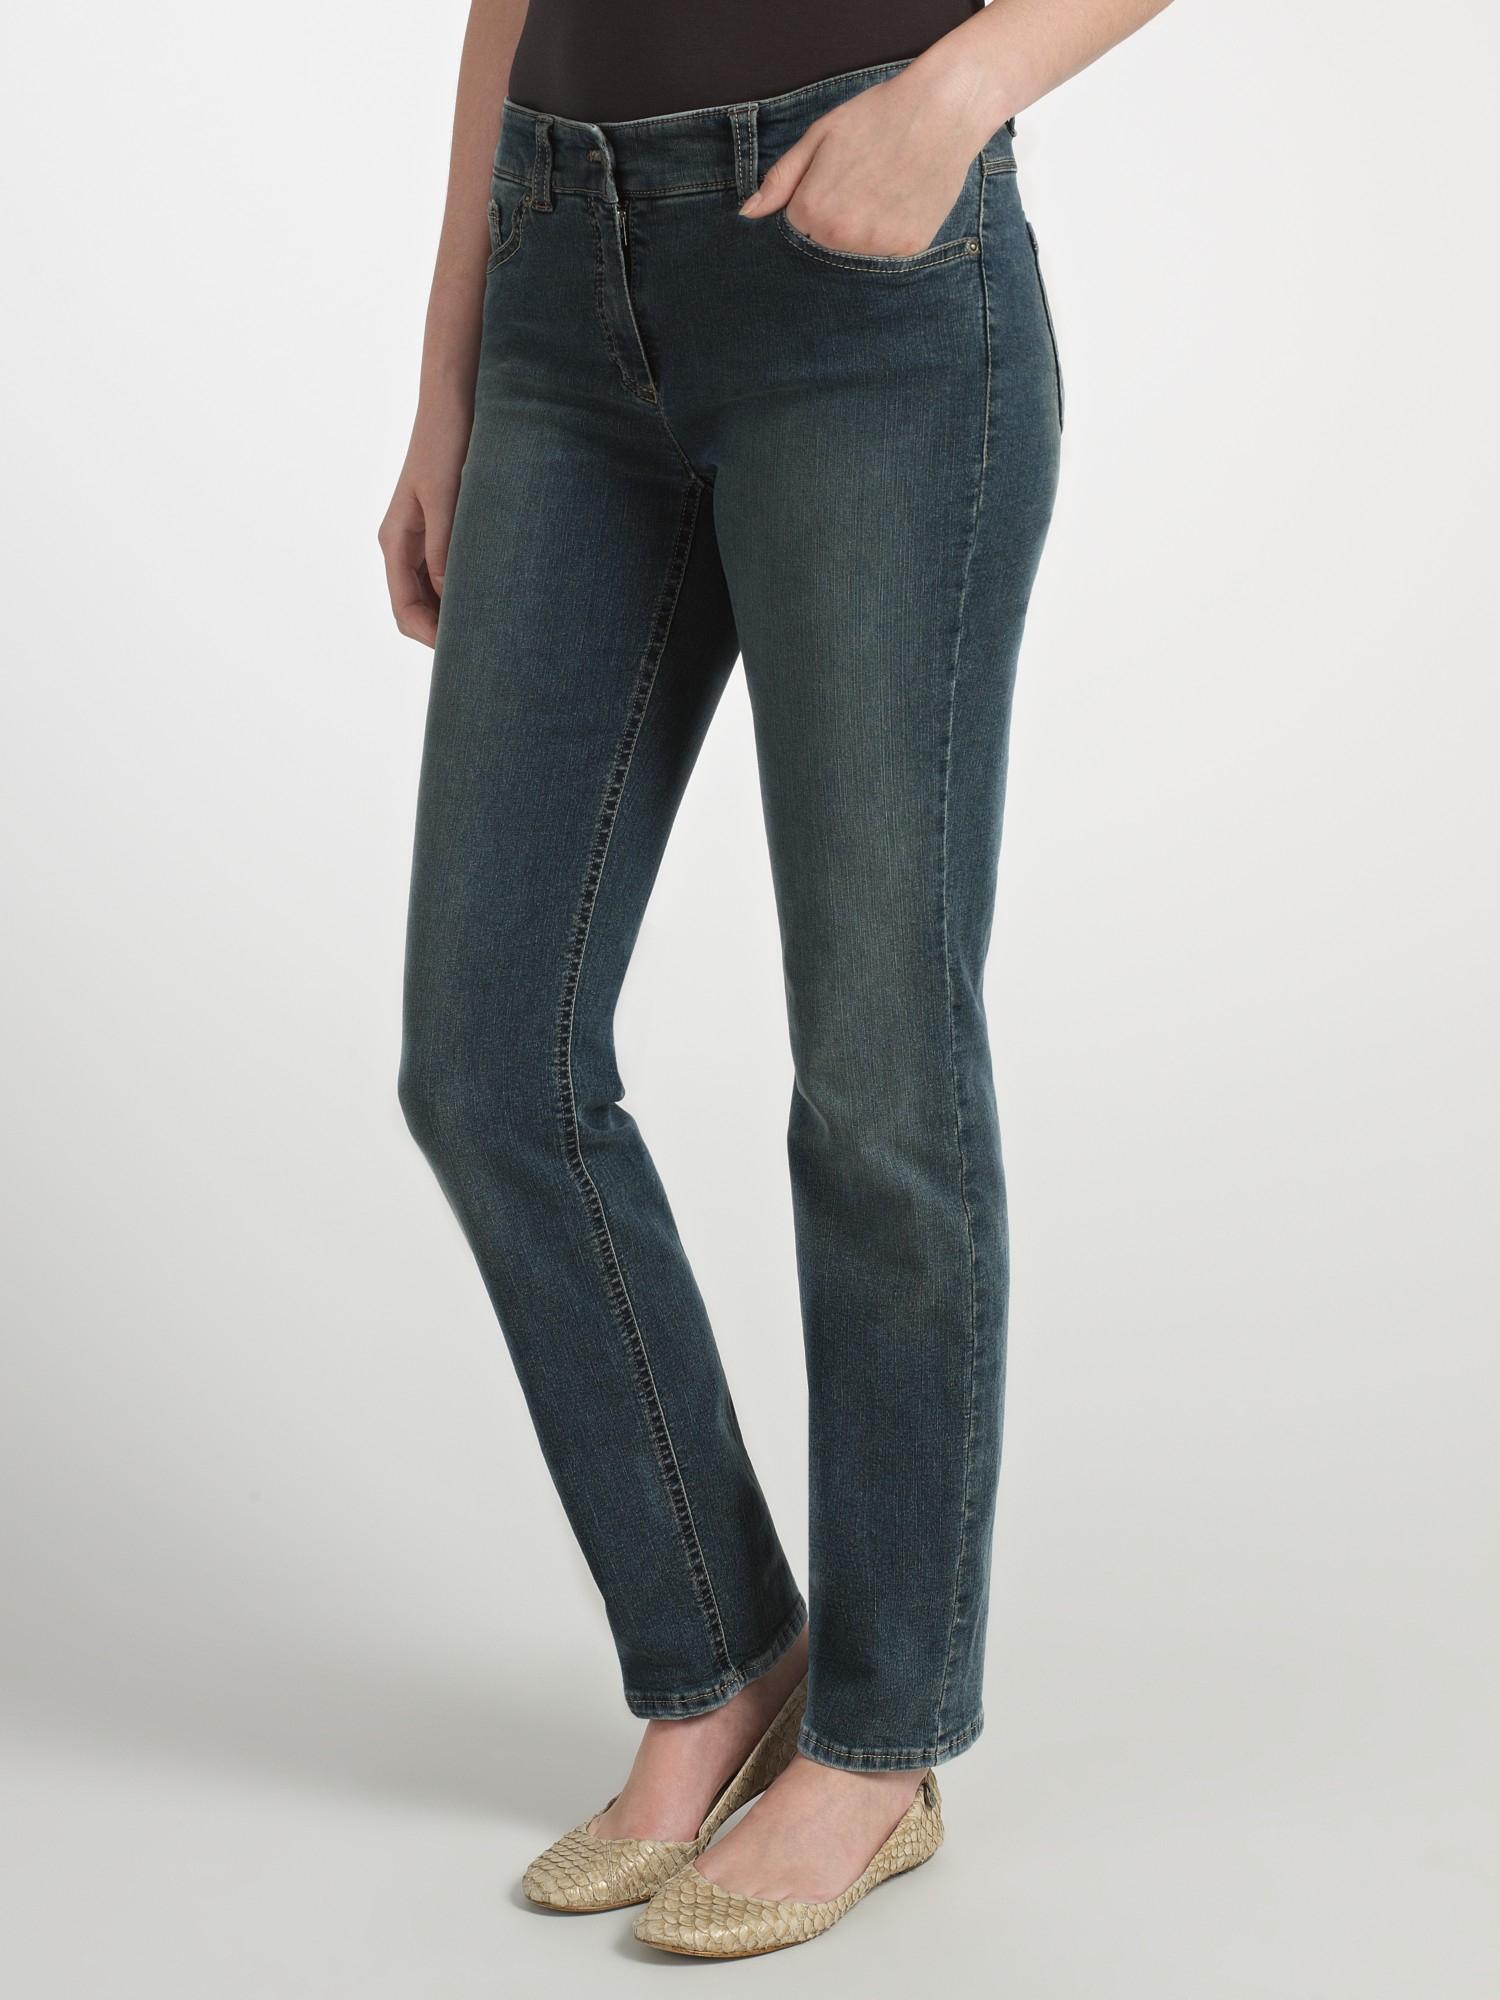 Gute Preise 100% authentifiziert Neues Produkt Roxy Perfect Fit Slim Jeans 33